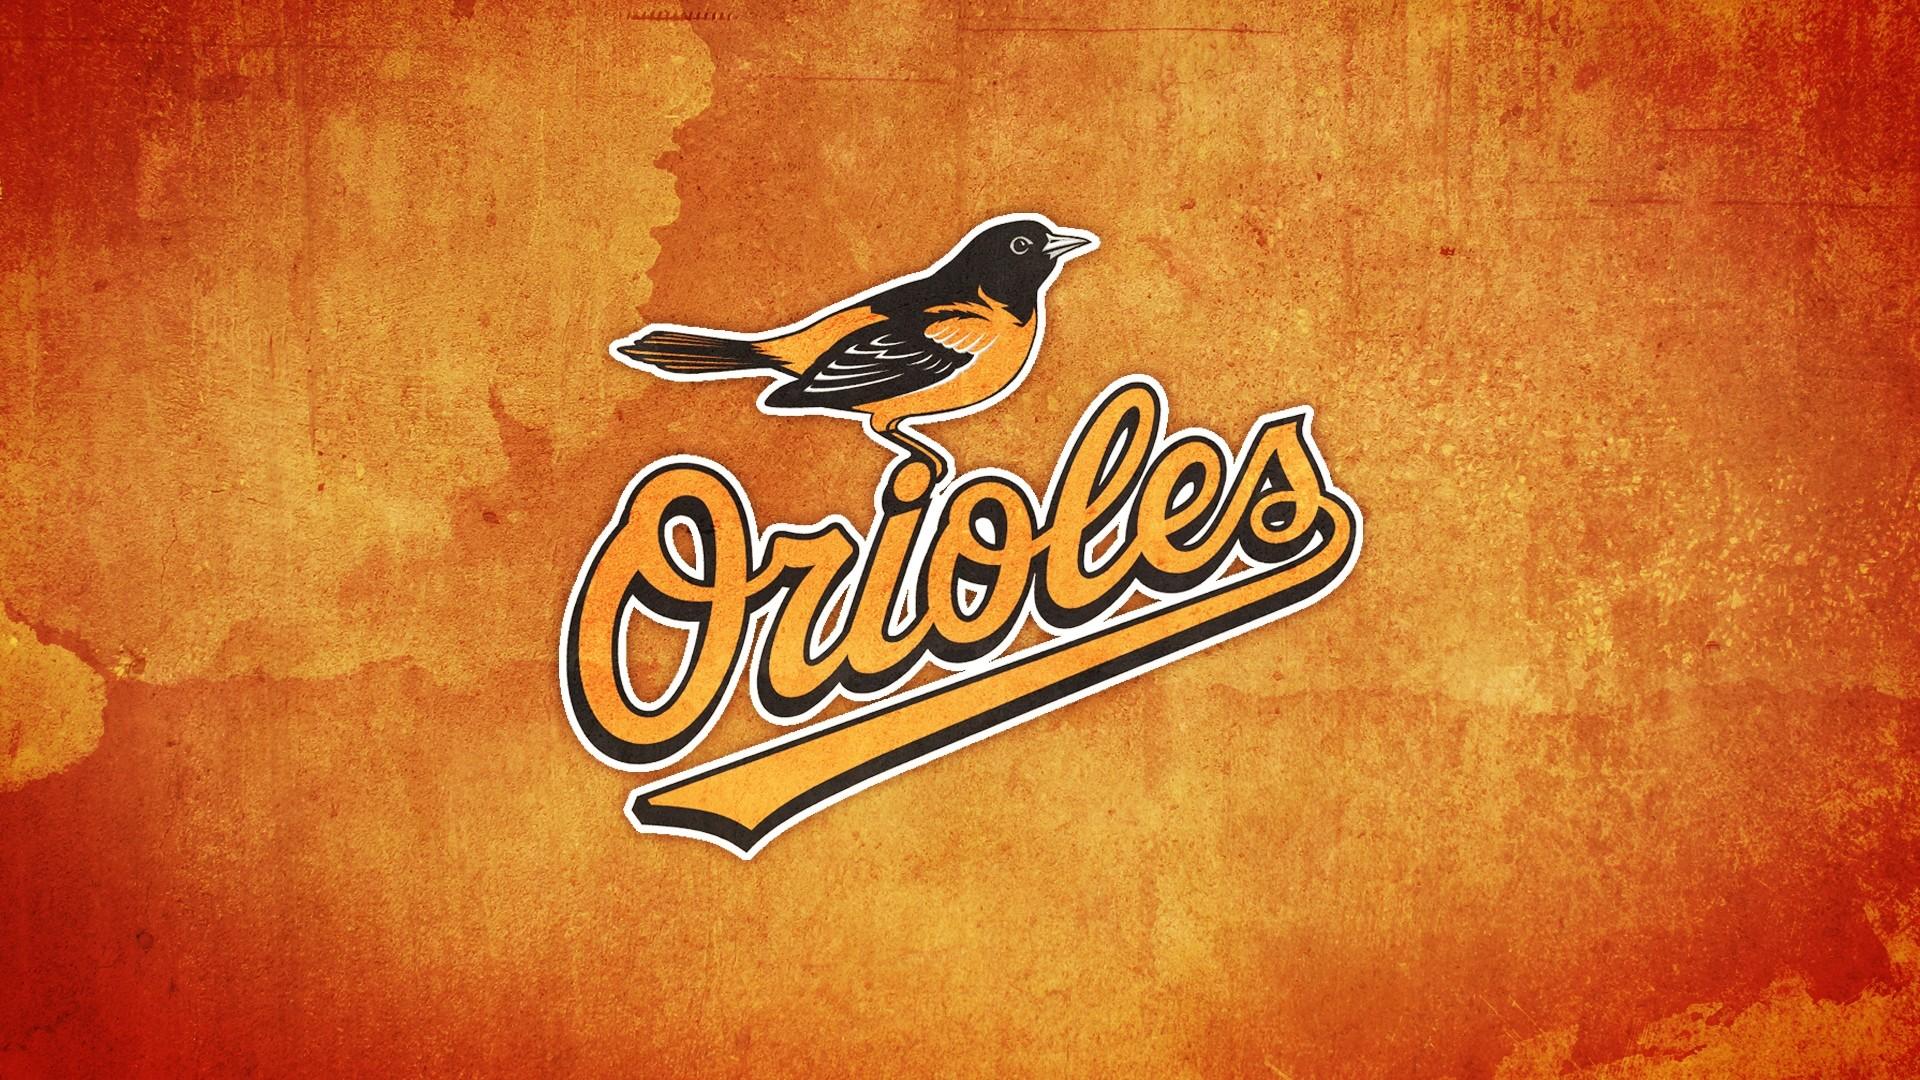 … Awsome Baltimore Orioles Background Wallpaper …